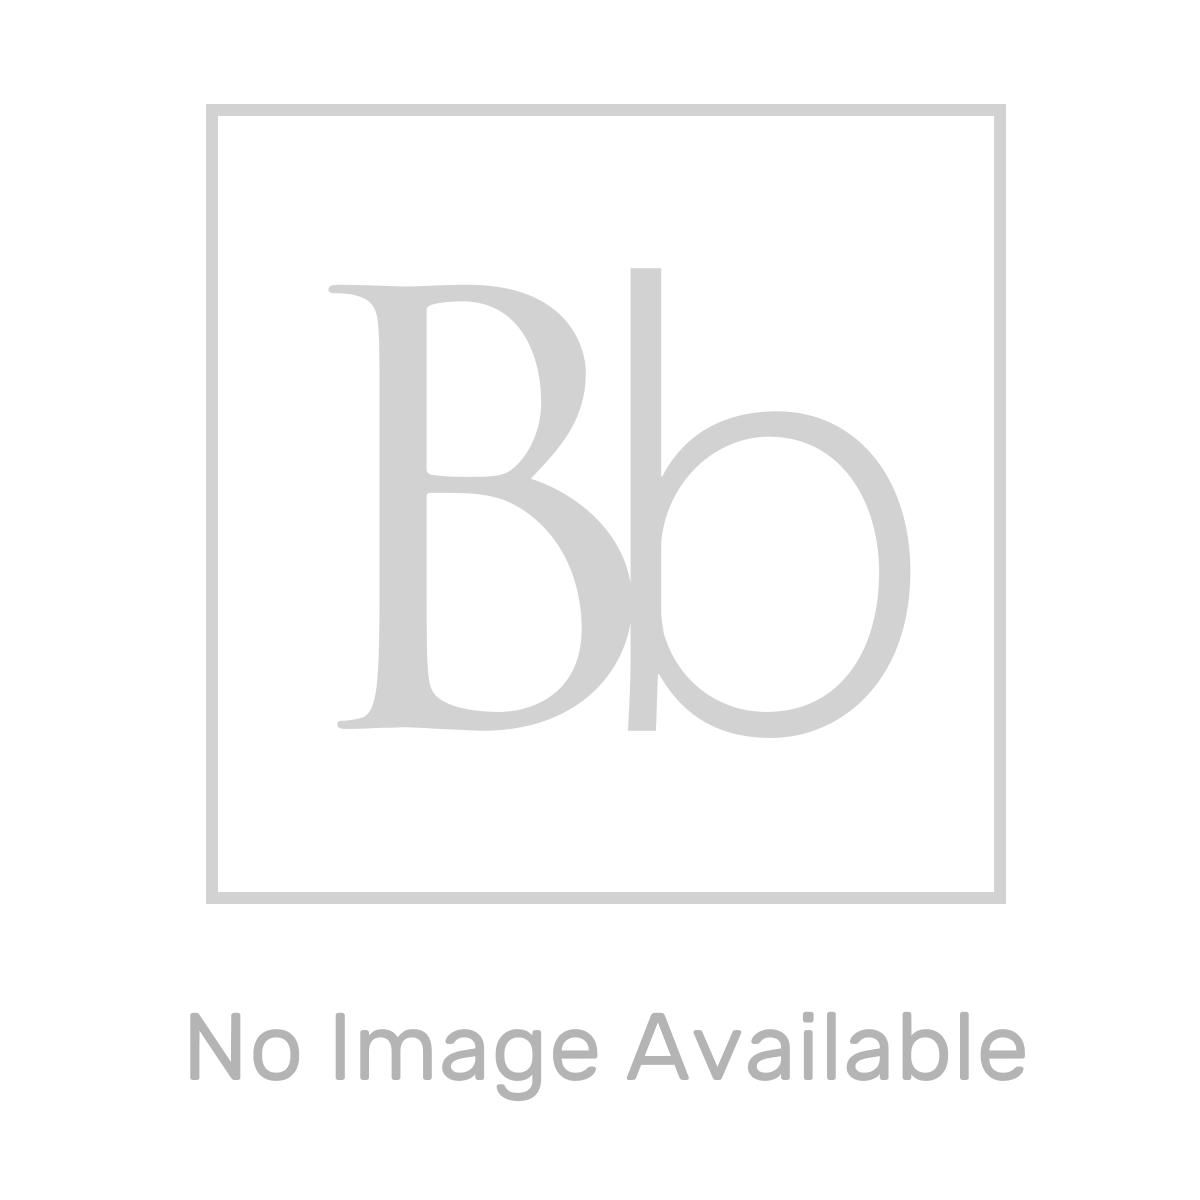 RAK Washington Grey Bathroom Mirror 1200mm Measurements